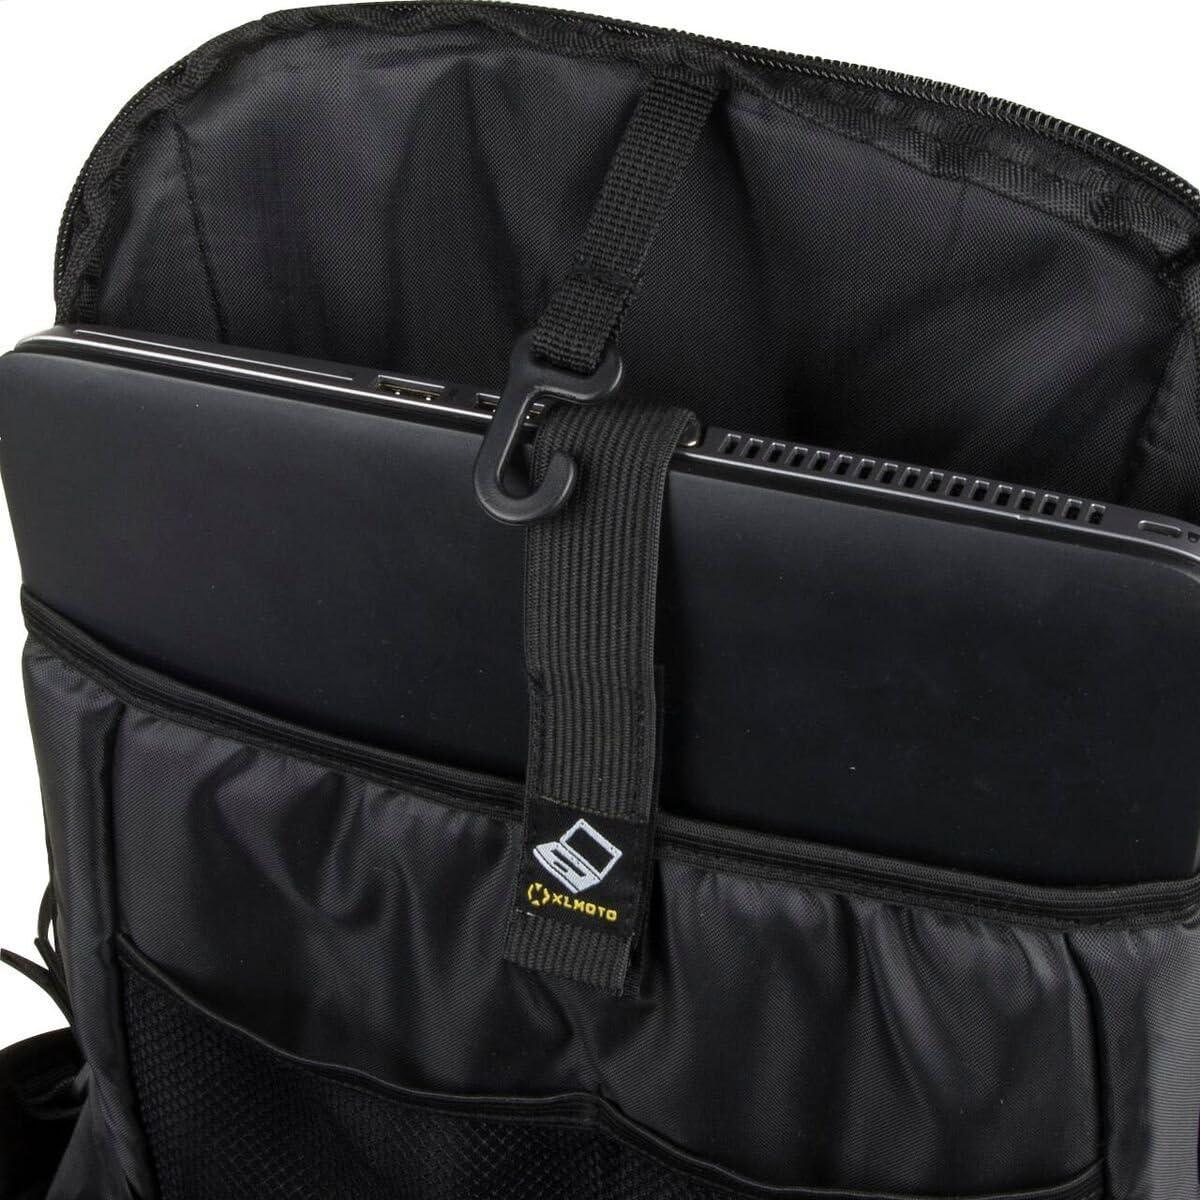 Xlmoto Slipstream Water Resistant Backpack 24l Black Bekleidung